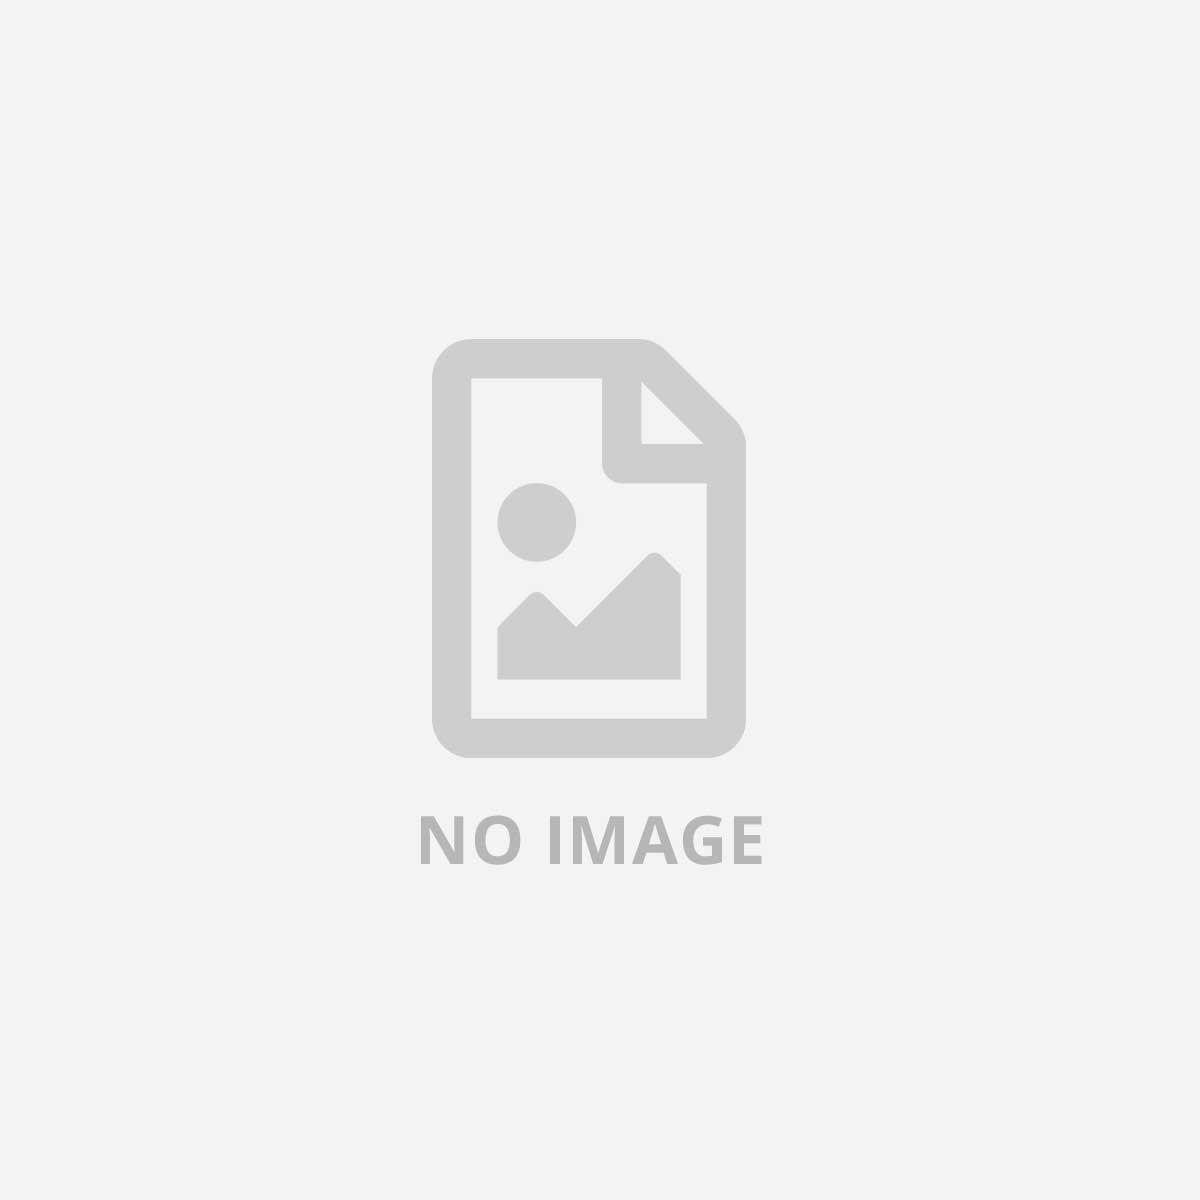 DELL HEATSINK FOR POWEREDGE T430  CUS KI